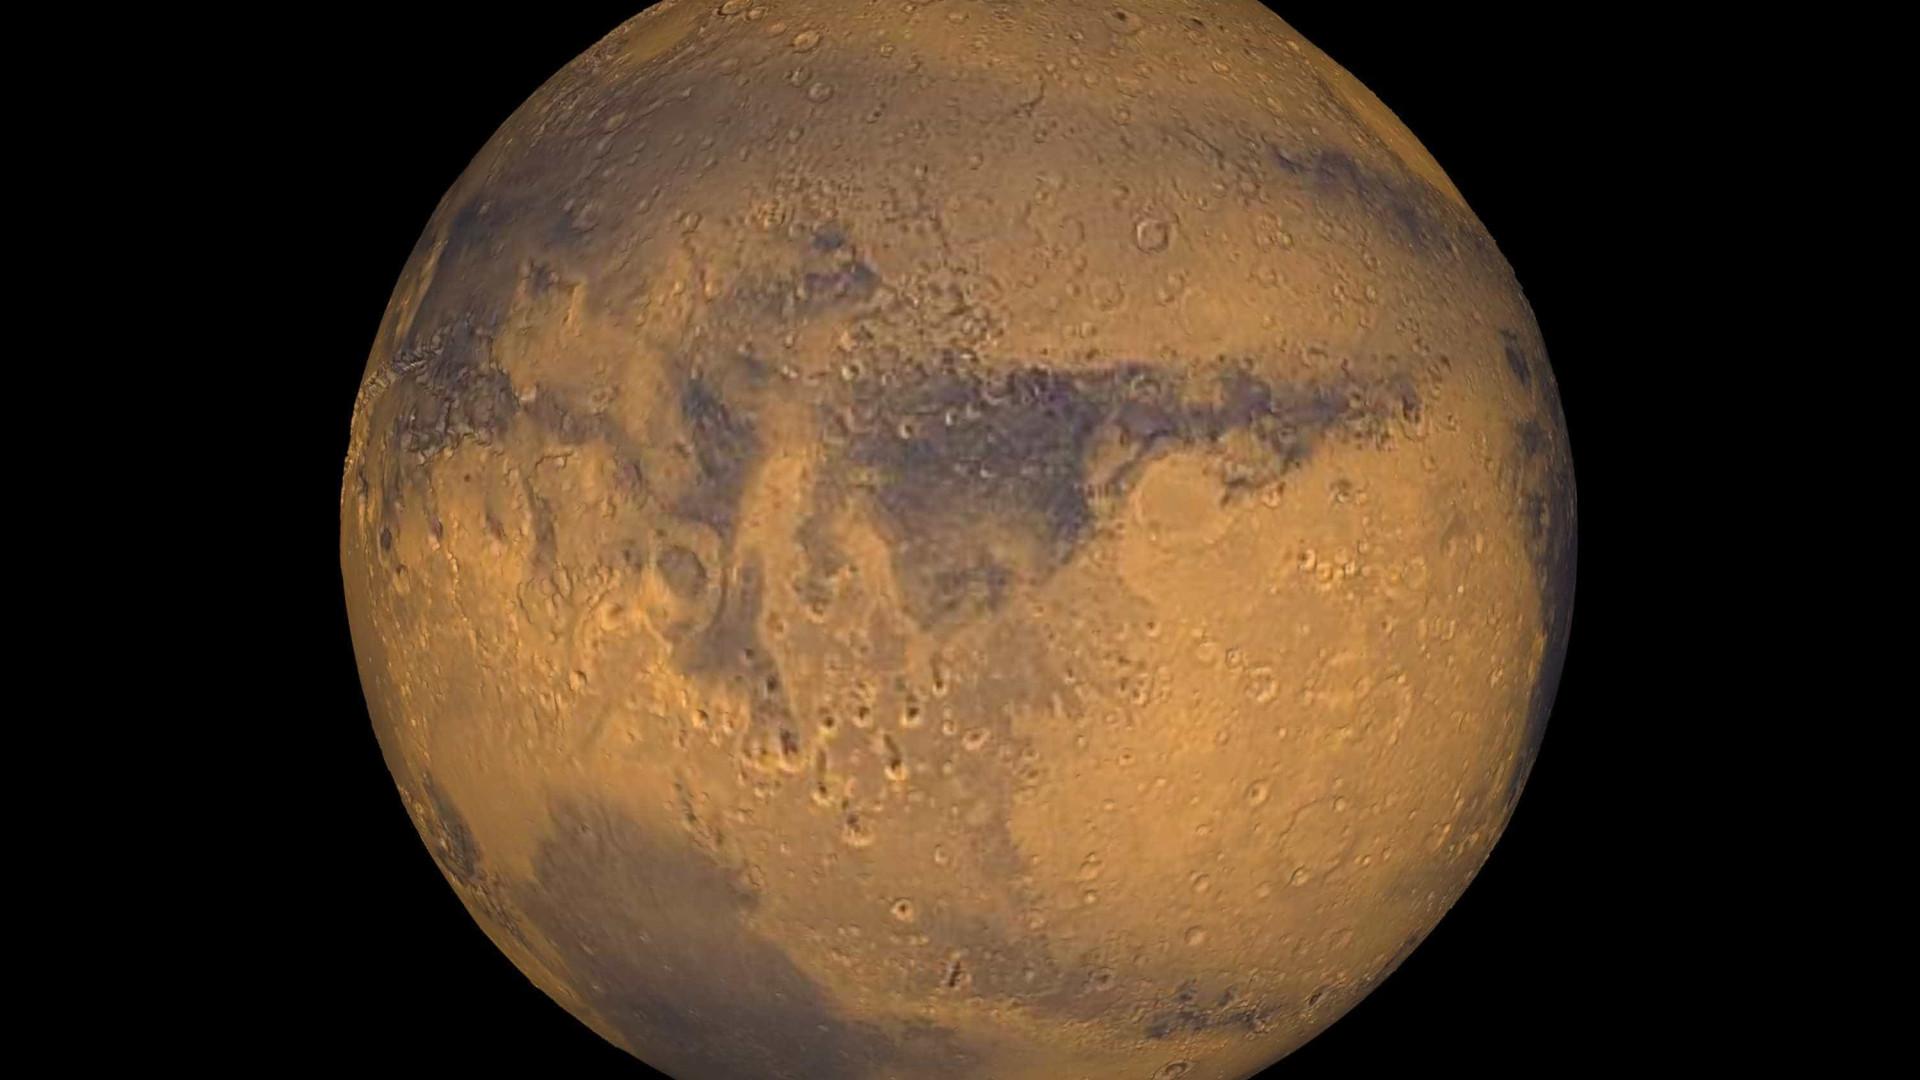 Descoberto novo risco mortal que pode impedir ida do homem a Marte